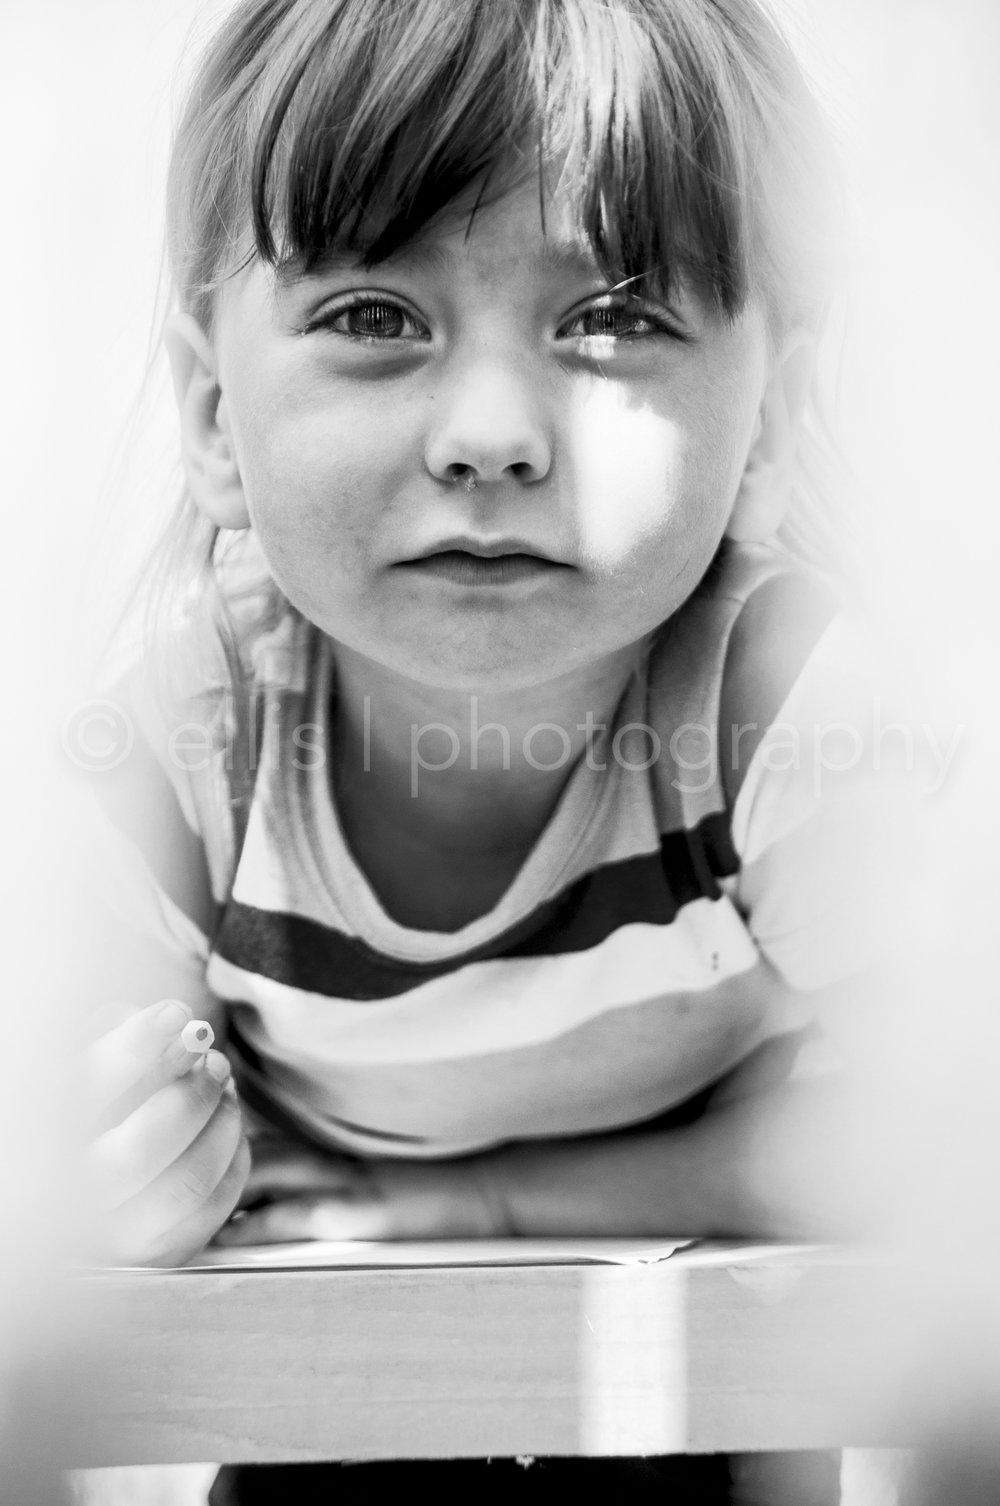 kid_blackandwhite_photography_girl.jpg